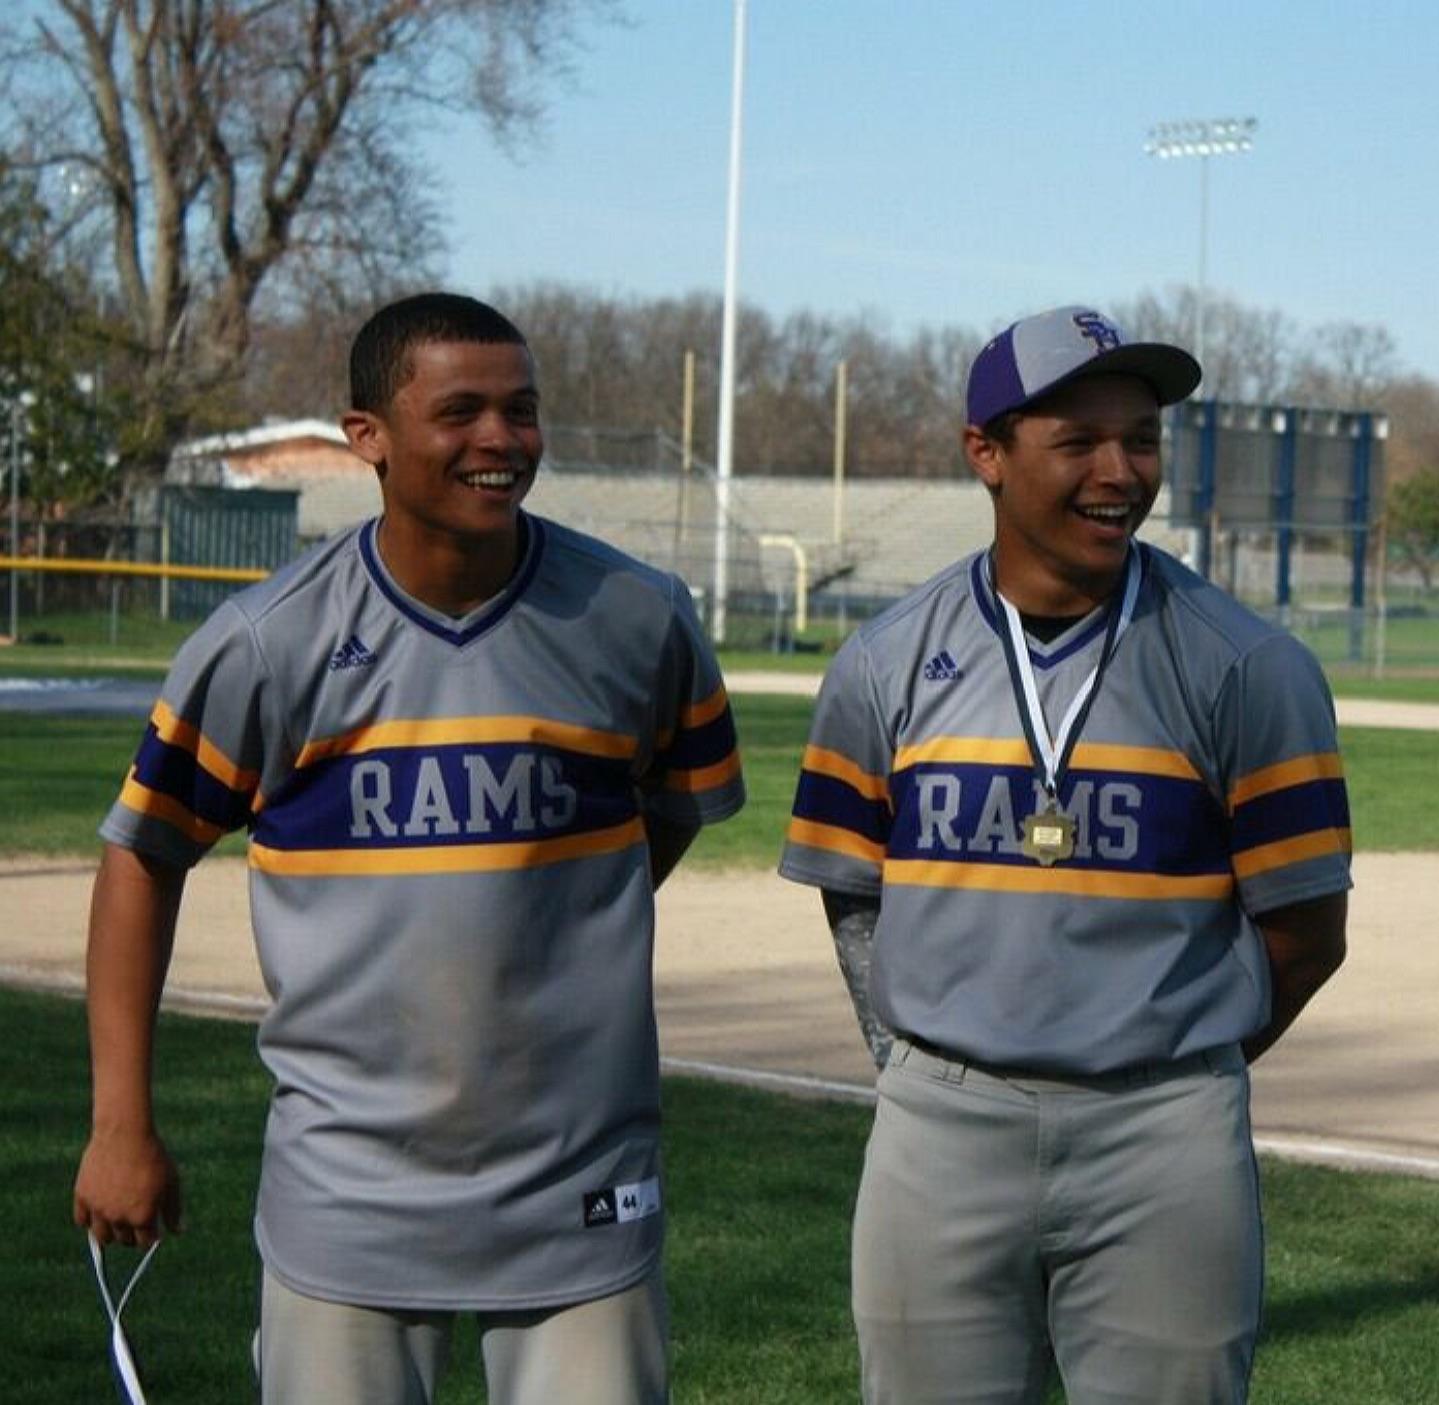 Two men pose for a photo, smiling, wearing baseball uniforms.